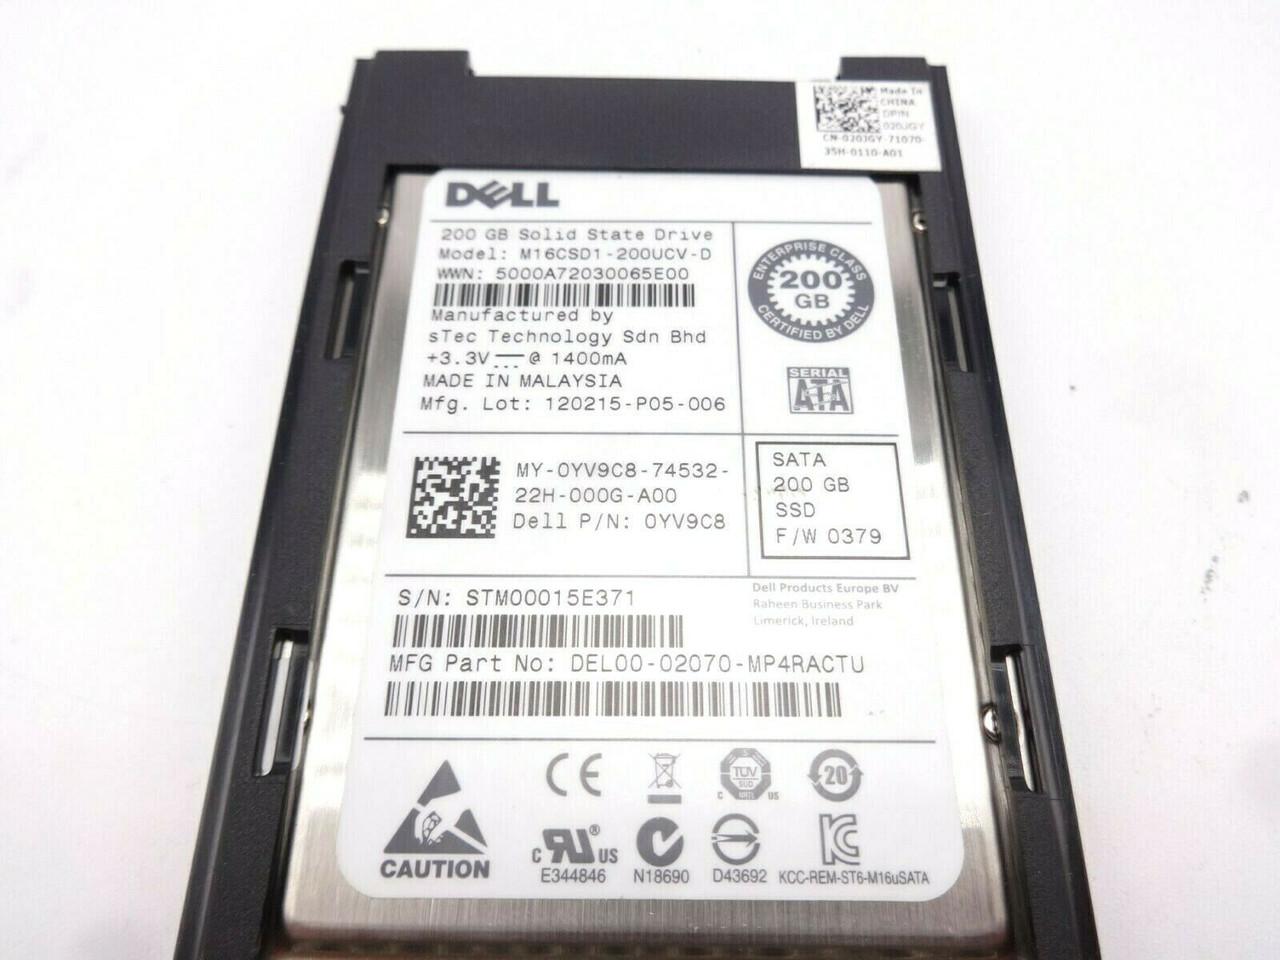 Dell YV9C8 200GB uSATA MLC SSD Solid State Hard Drive